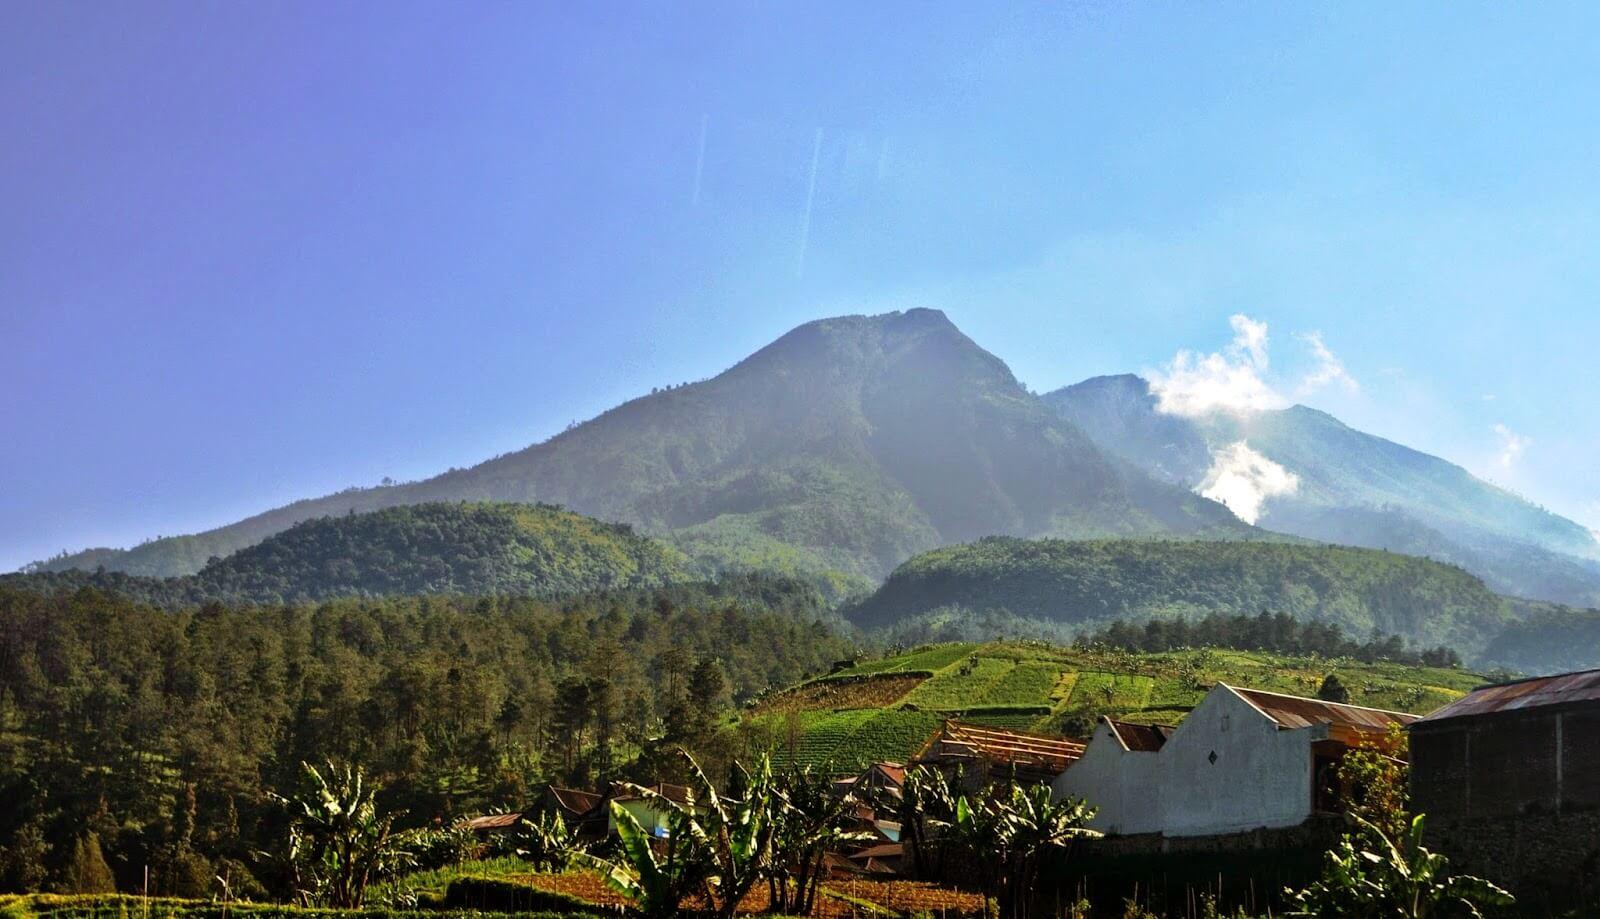 pendakian gunung lawu, Pendakian Gunung Lawu, Beberapa Jalur Yang Dapat Dilalui, SHUNT Magetan